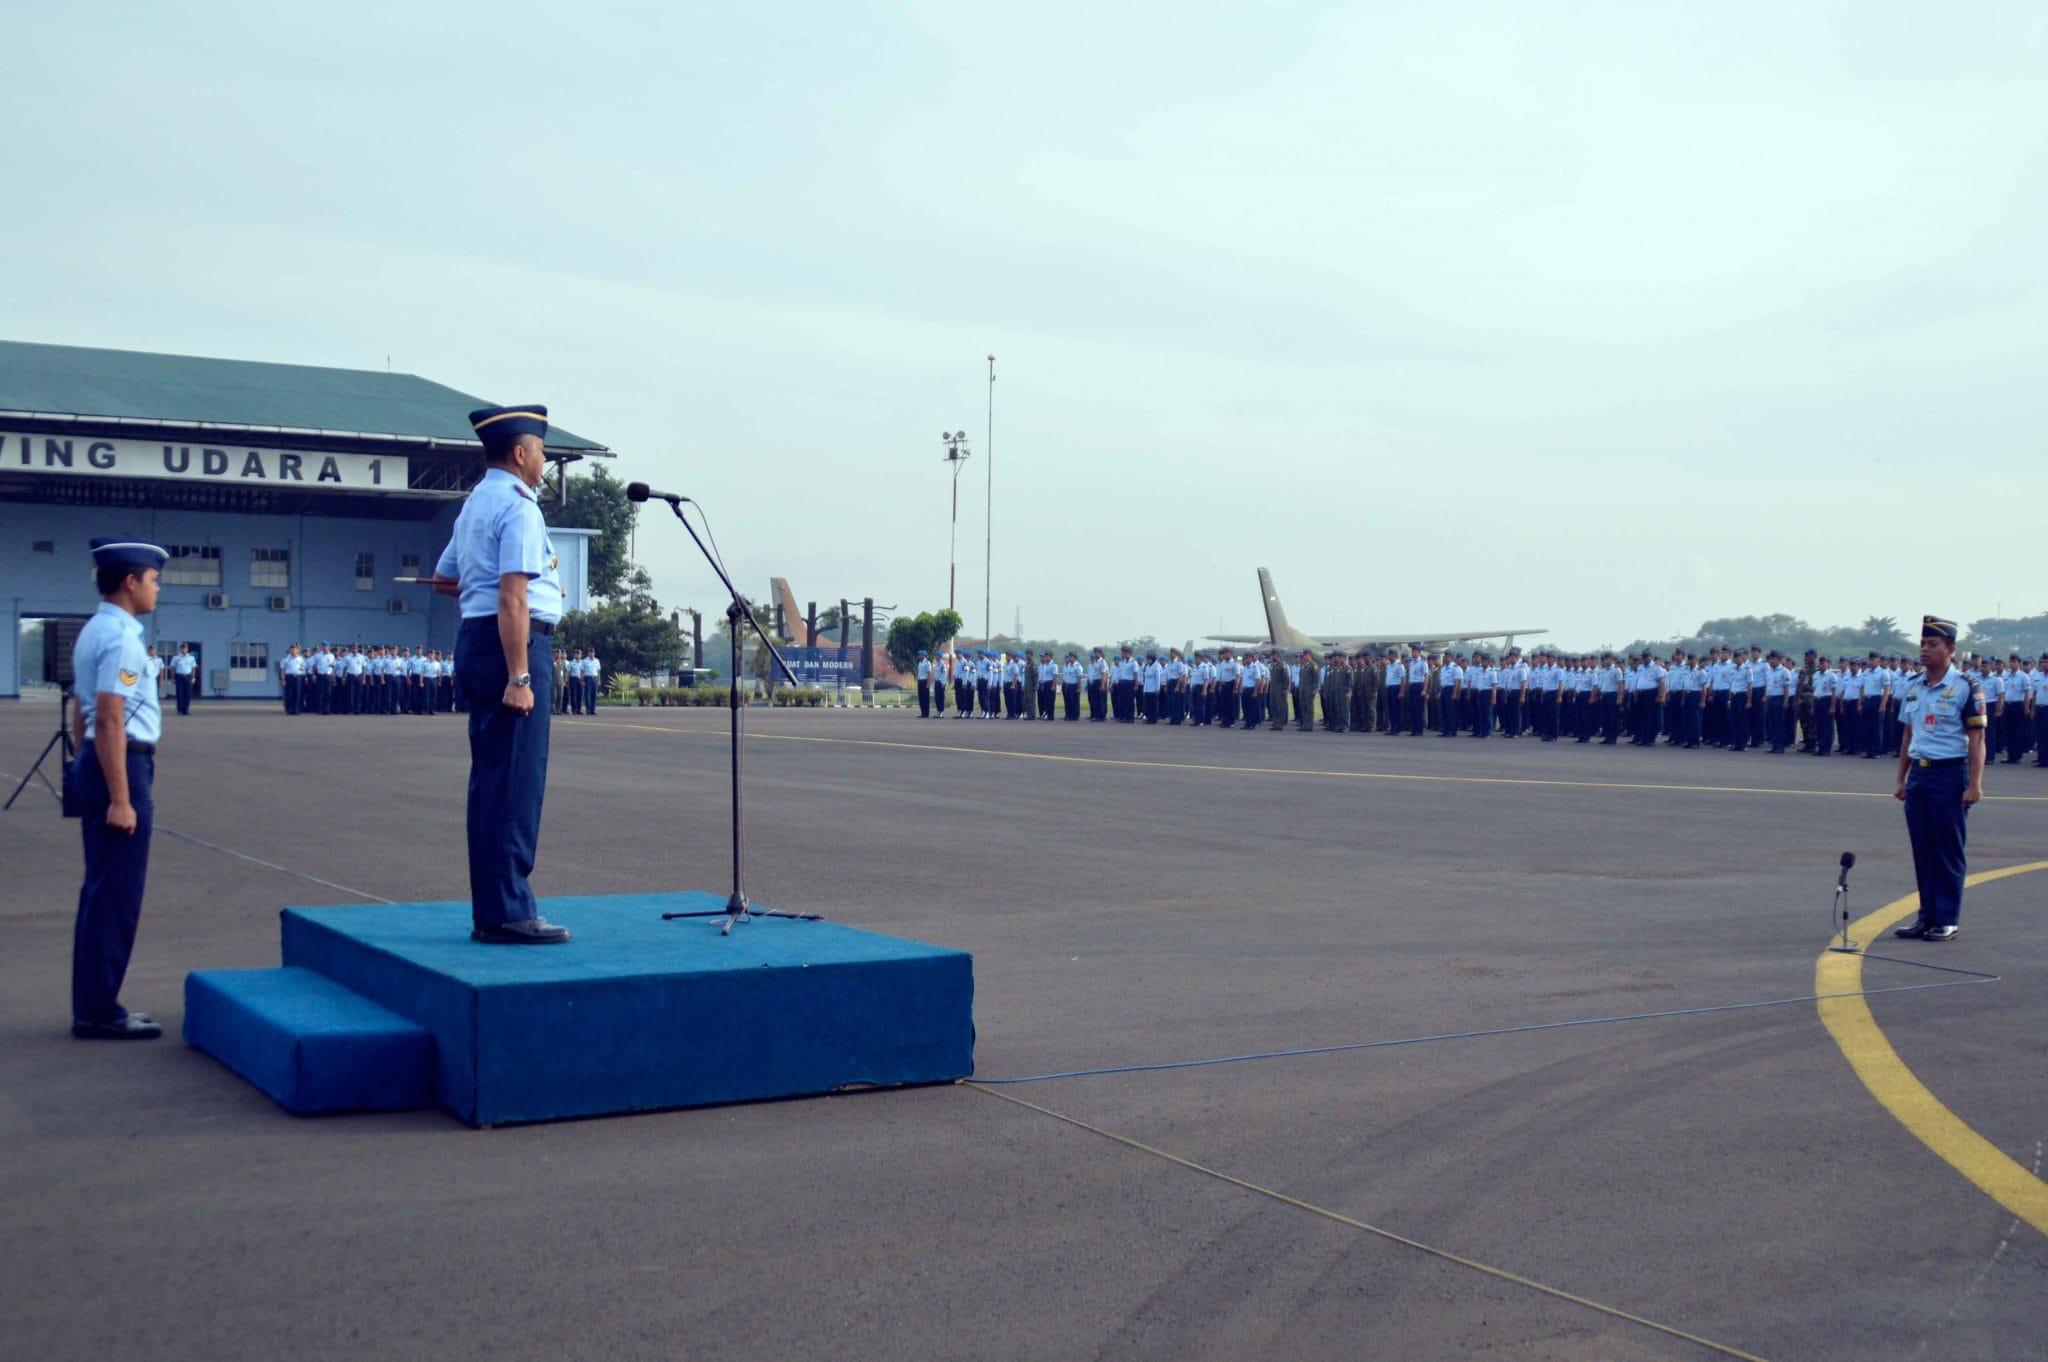 Apel Khusus Lanud Halim Perdanakusuma: Alutsista TNI AU Milik Rakyat